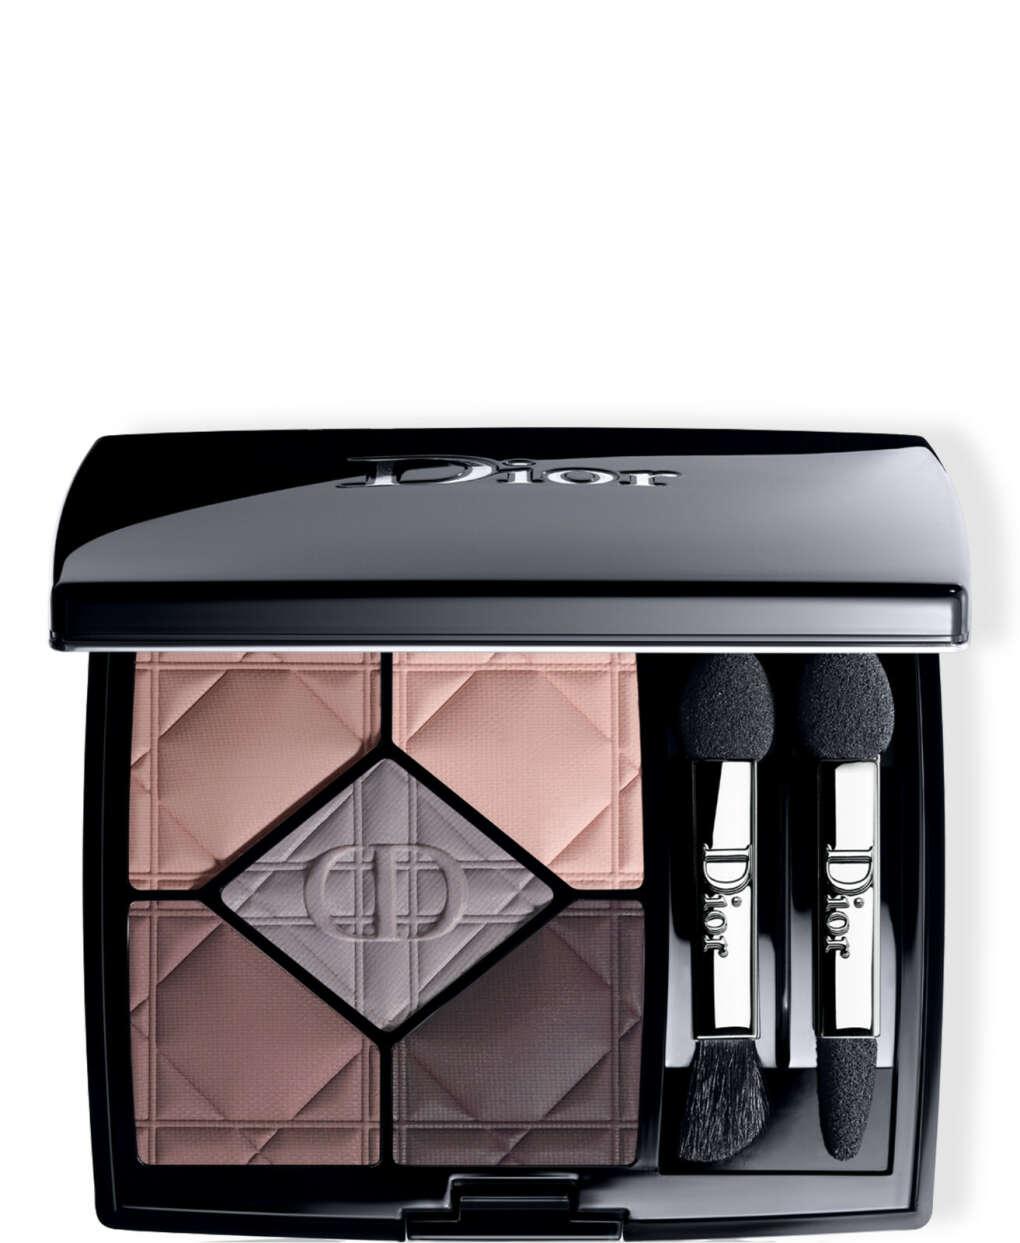 Dior 5 Couleurs, тени для век, оттенок 757 Мечта